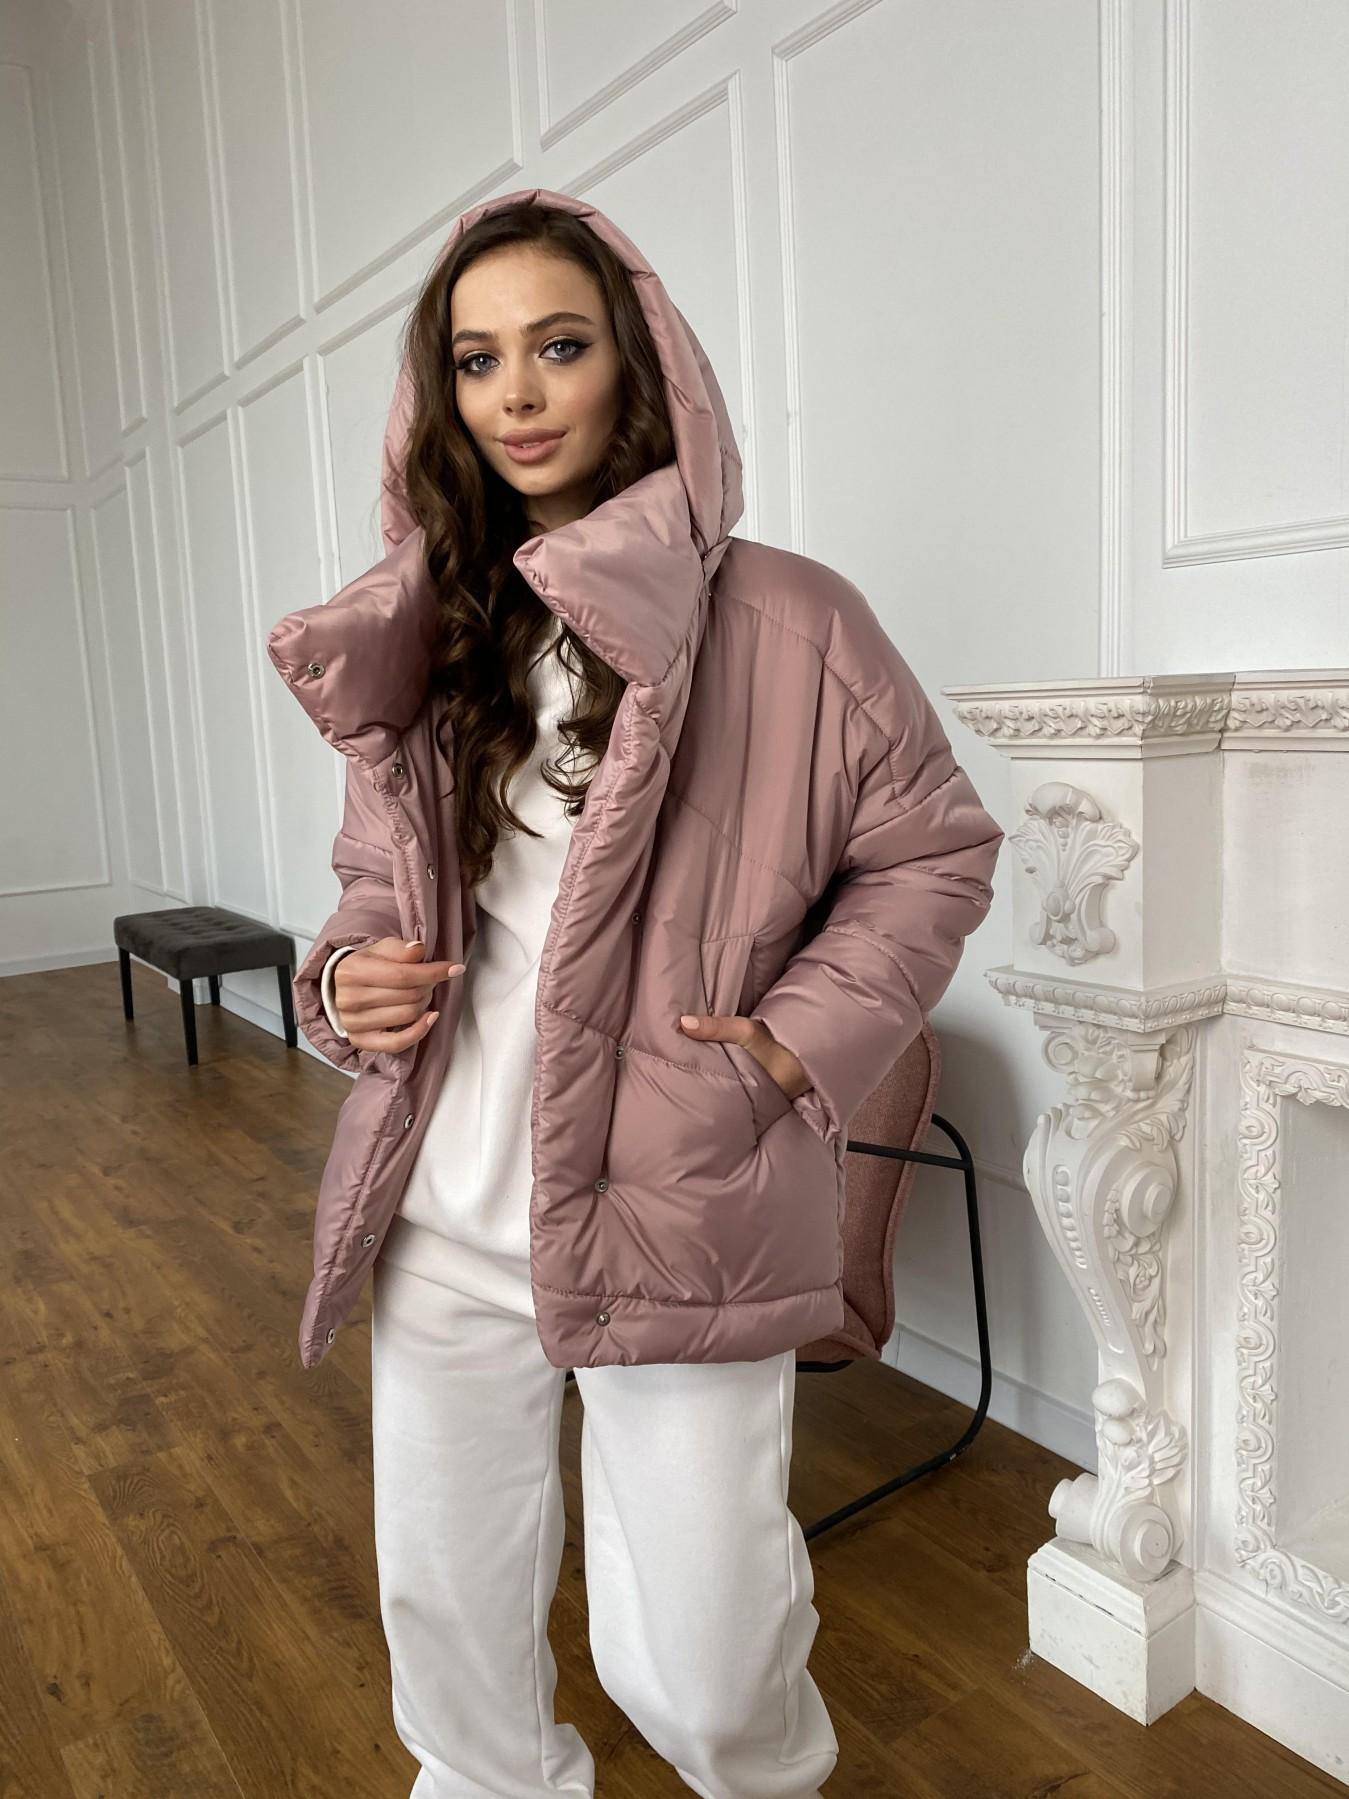 Уно куртка плащевка Ammy 10671 АРТ. 47409 Цвет: Пудра - фото 5, интернет магазин tm-modus.ru